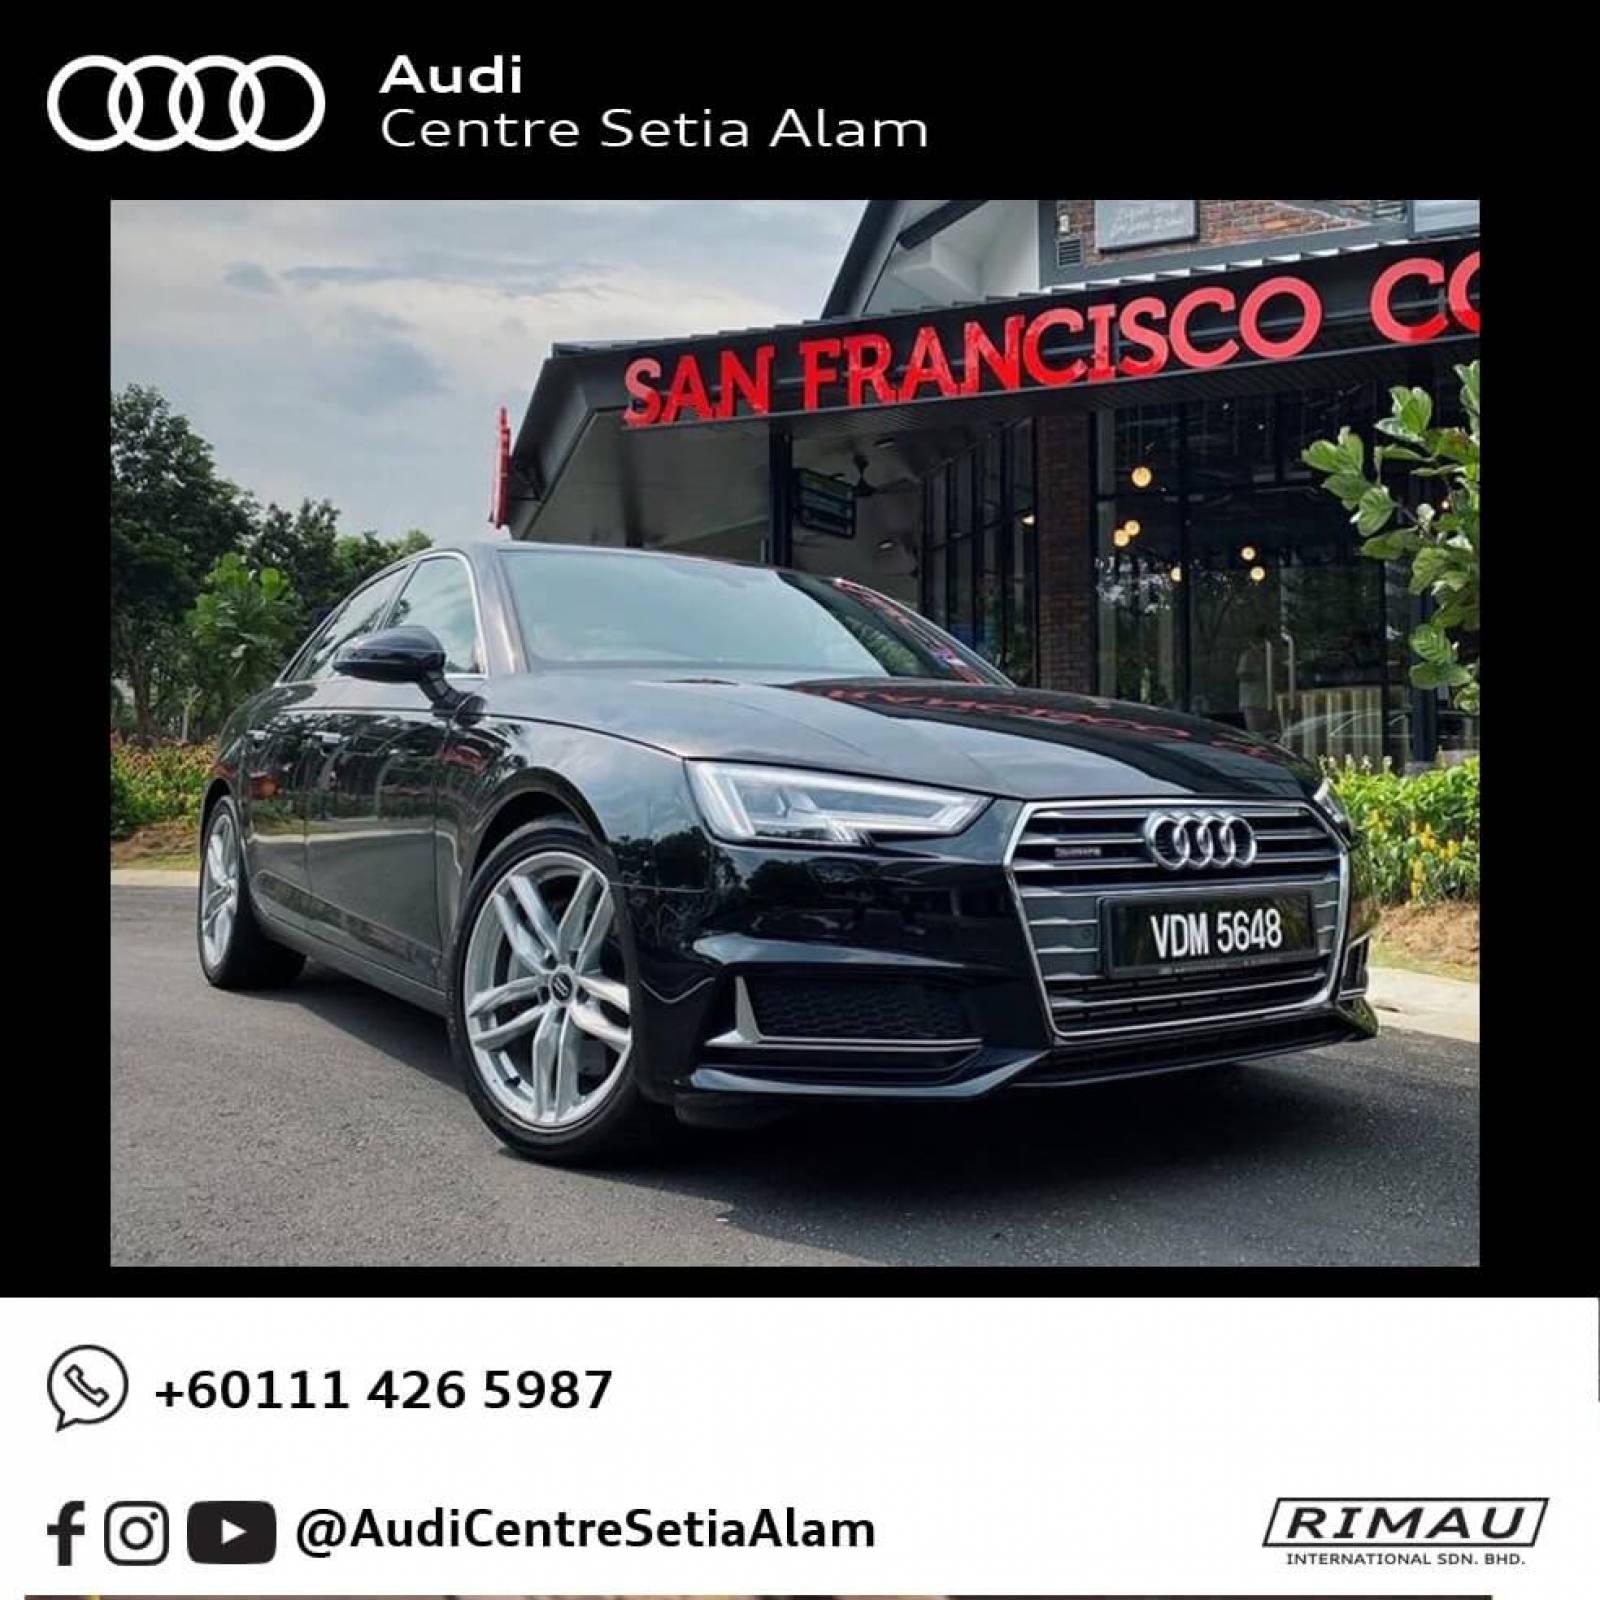 2019 Audi A4 2.0 TFSI Quattro - Demo